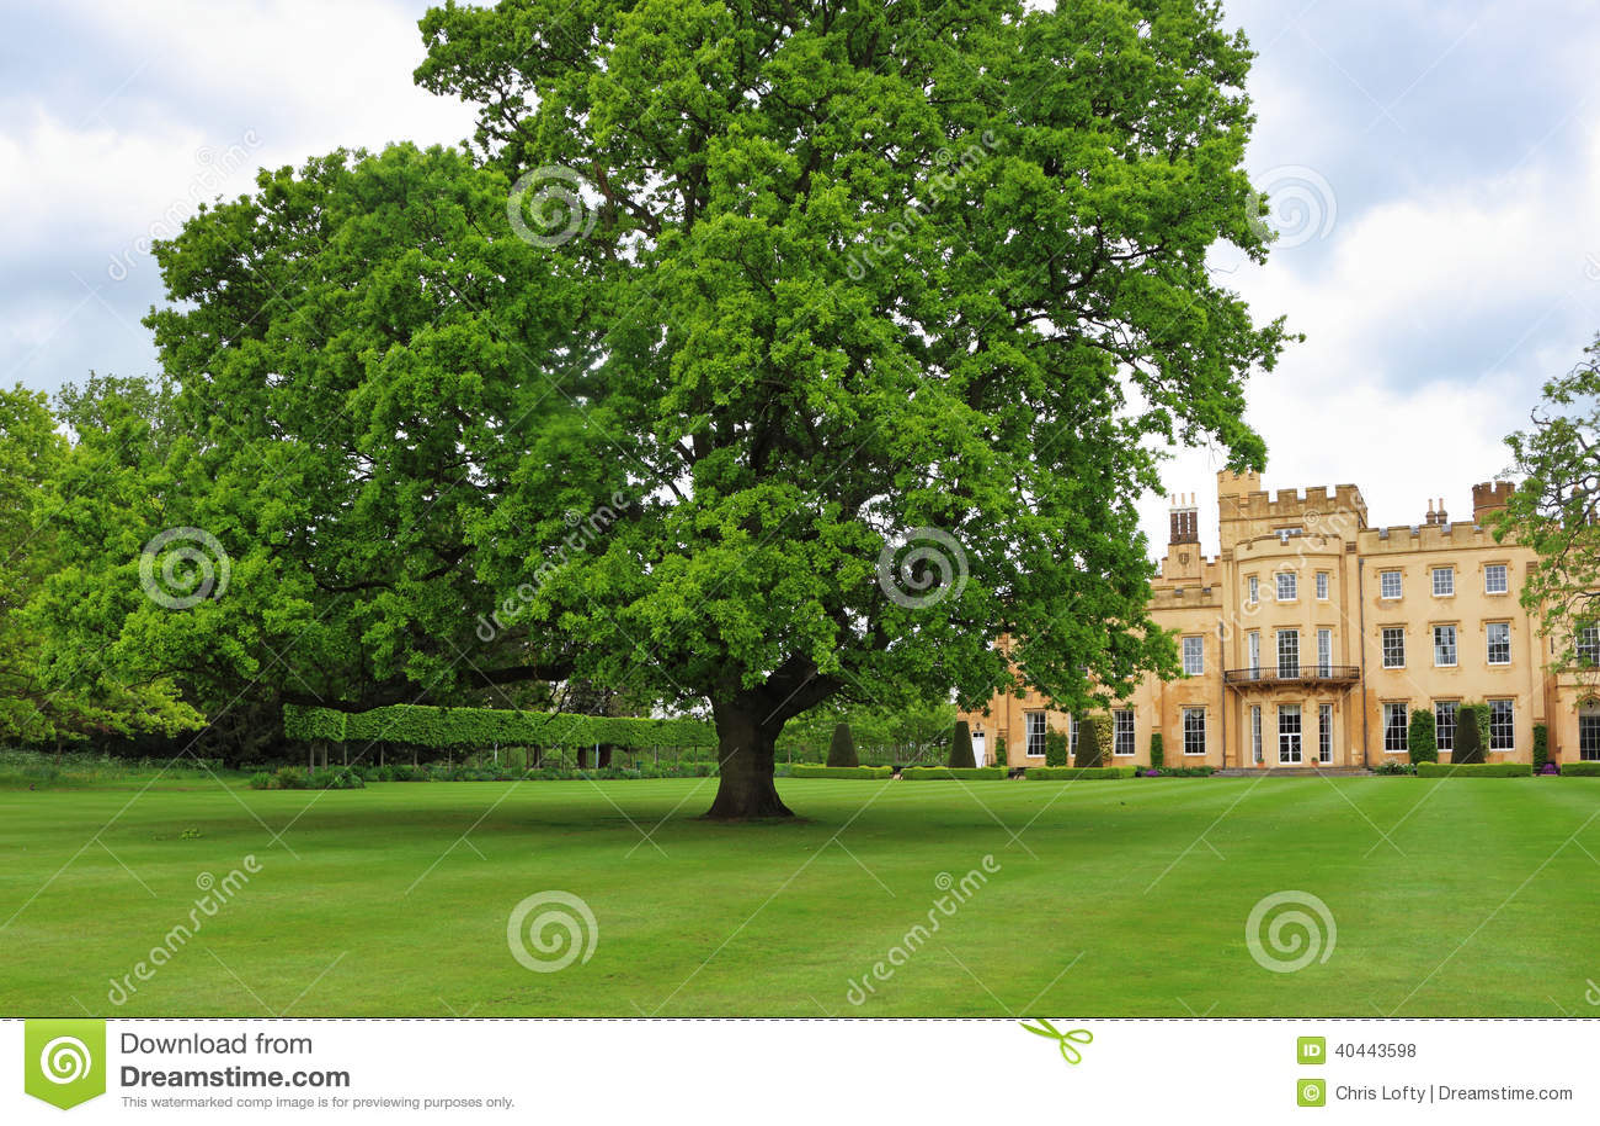 English Country Manor House Stock Photo - Image: 40443598